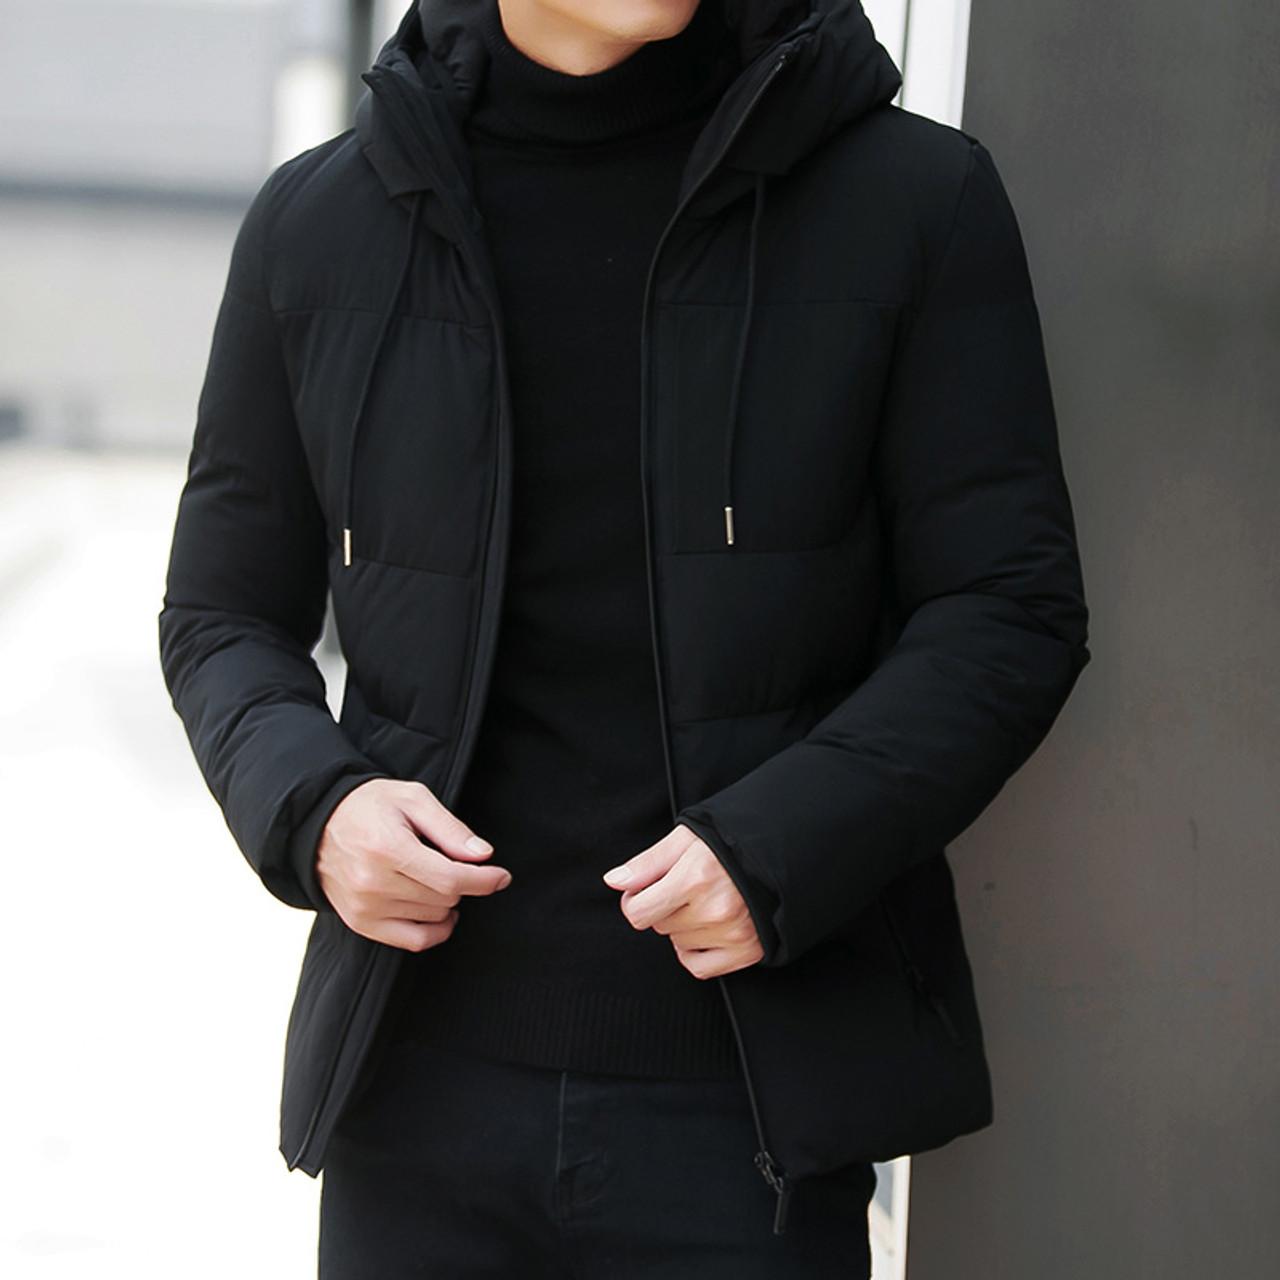 Winter Jacket Men Parka Fashion Hooded Jacket Slim Cotton Warm